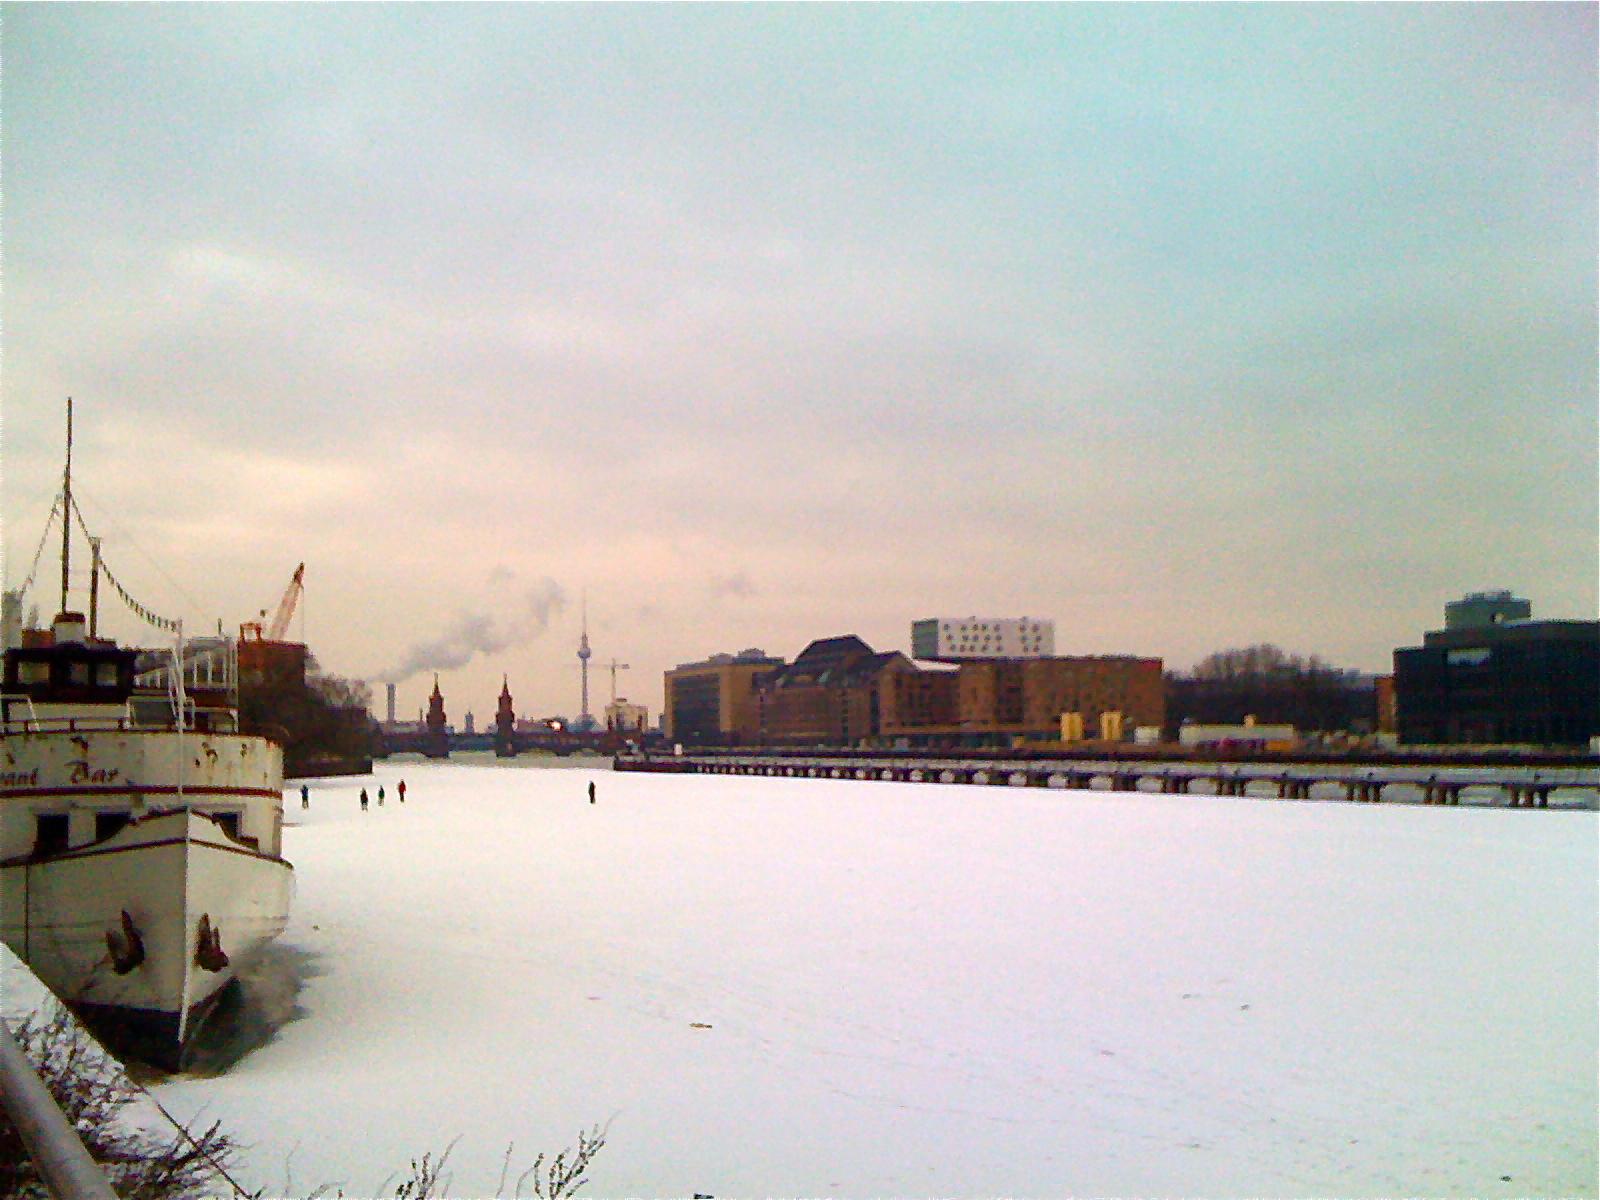 Frozen Spree, Berlin w/ Oberbaumbrücke and TV-tower